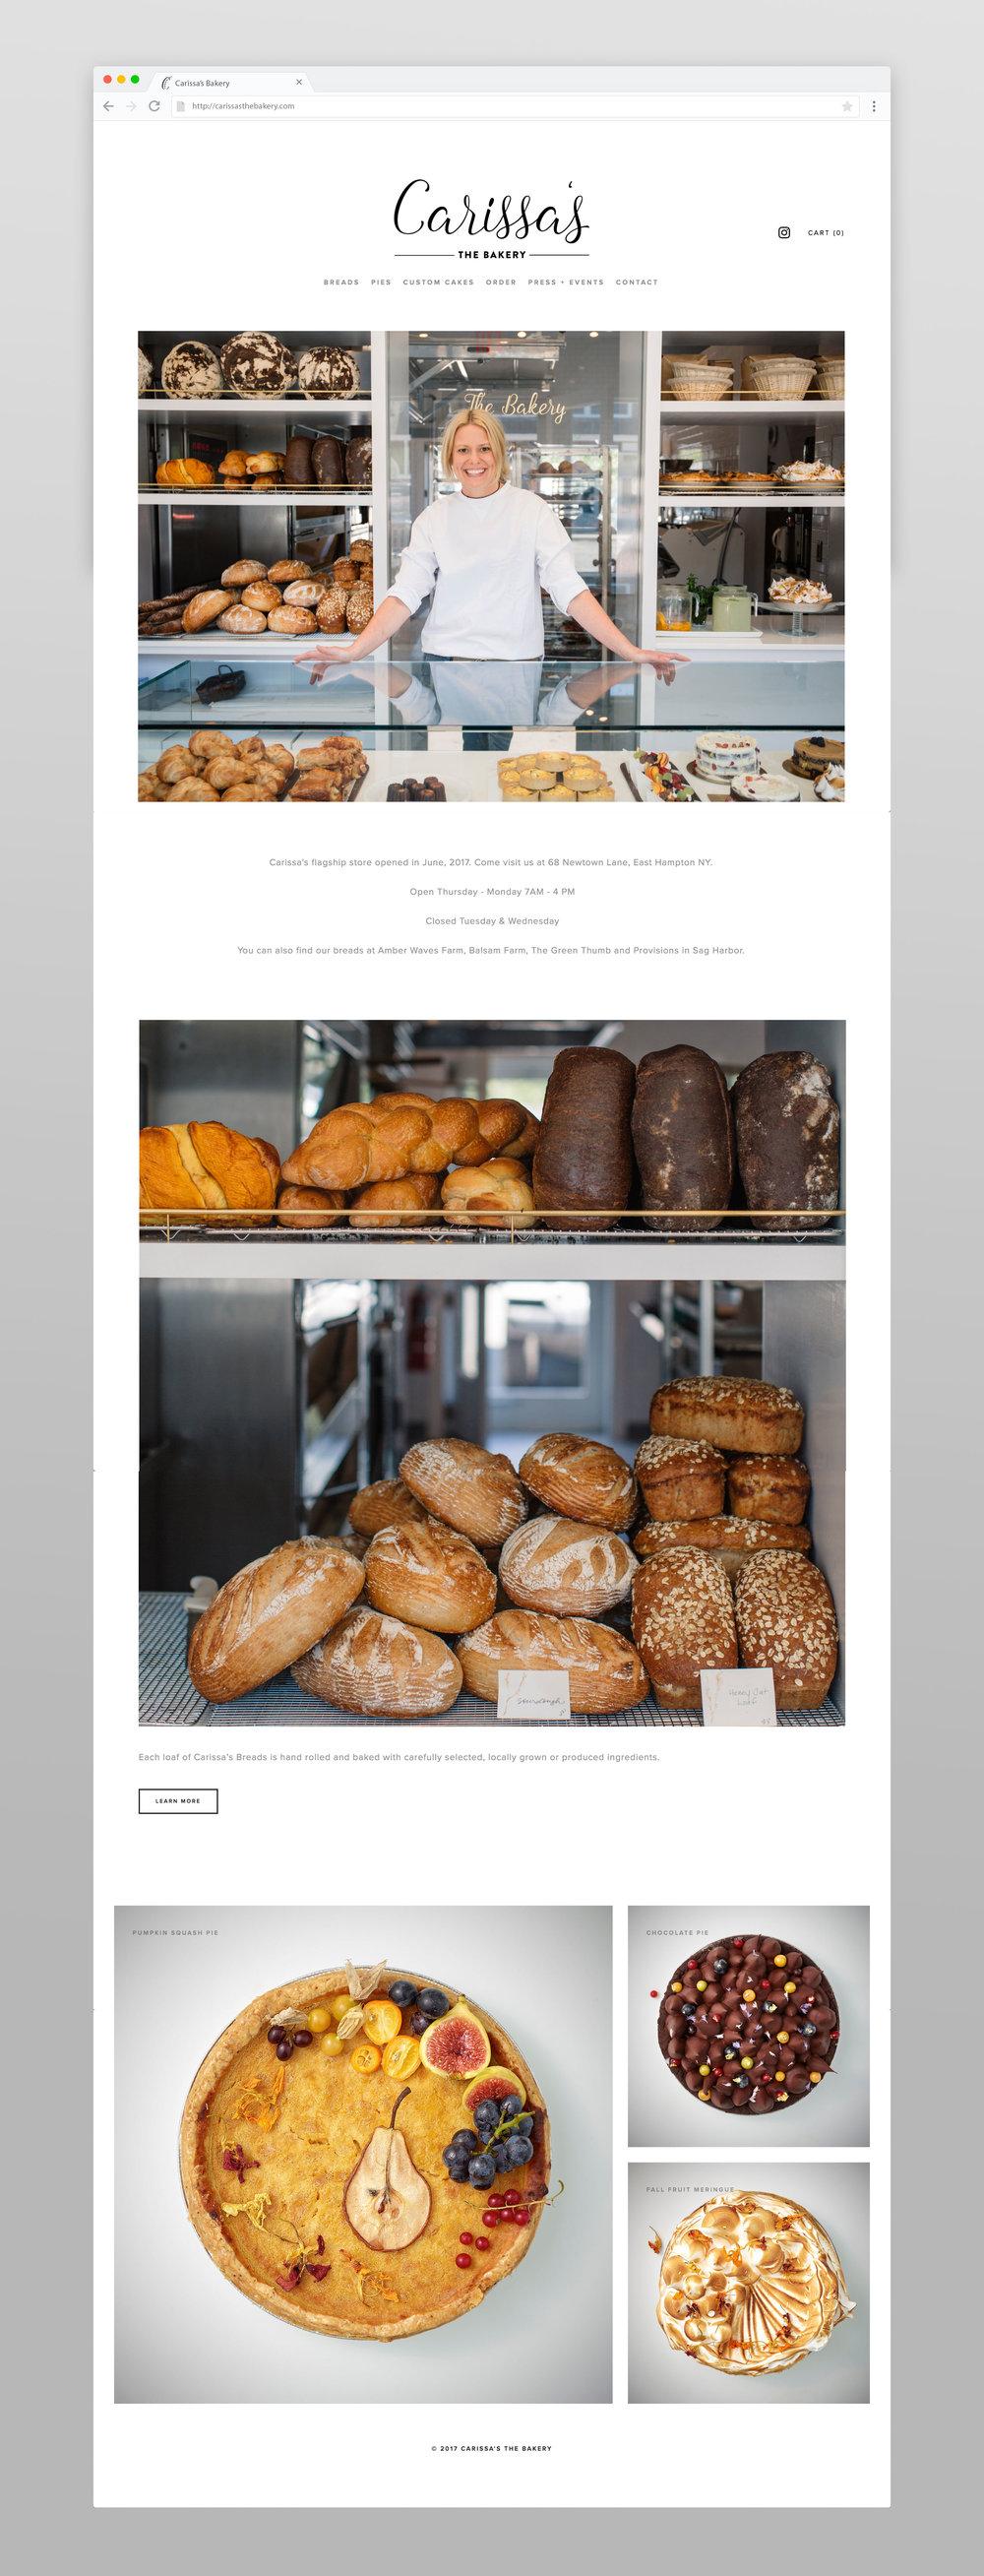 Carissa's Bakery Website